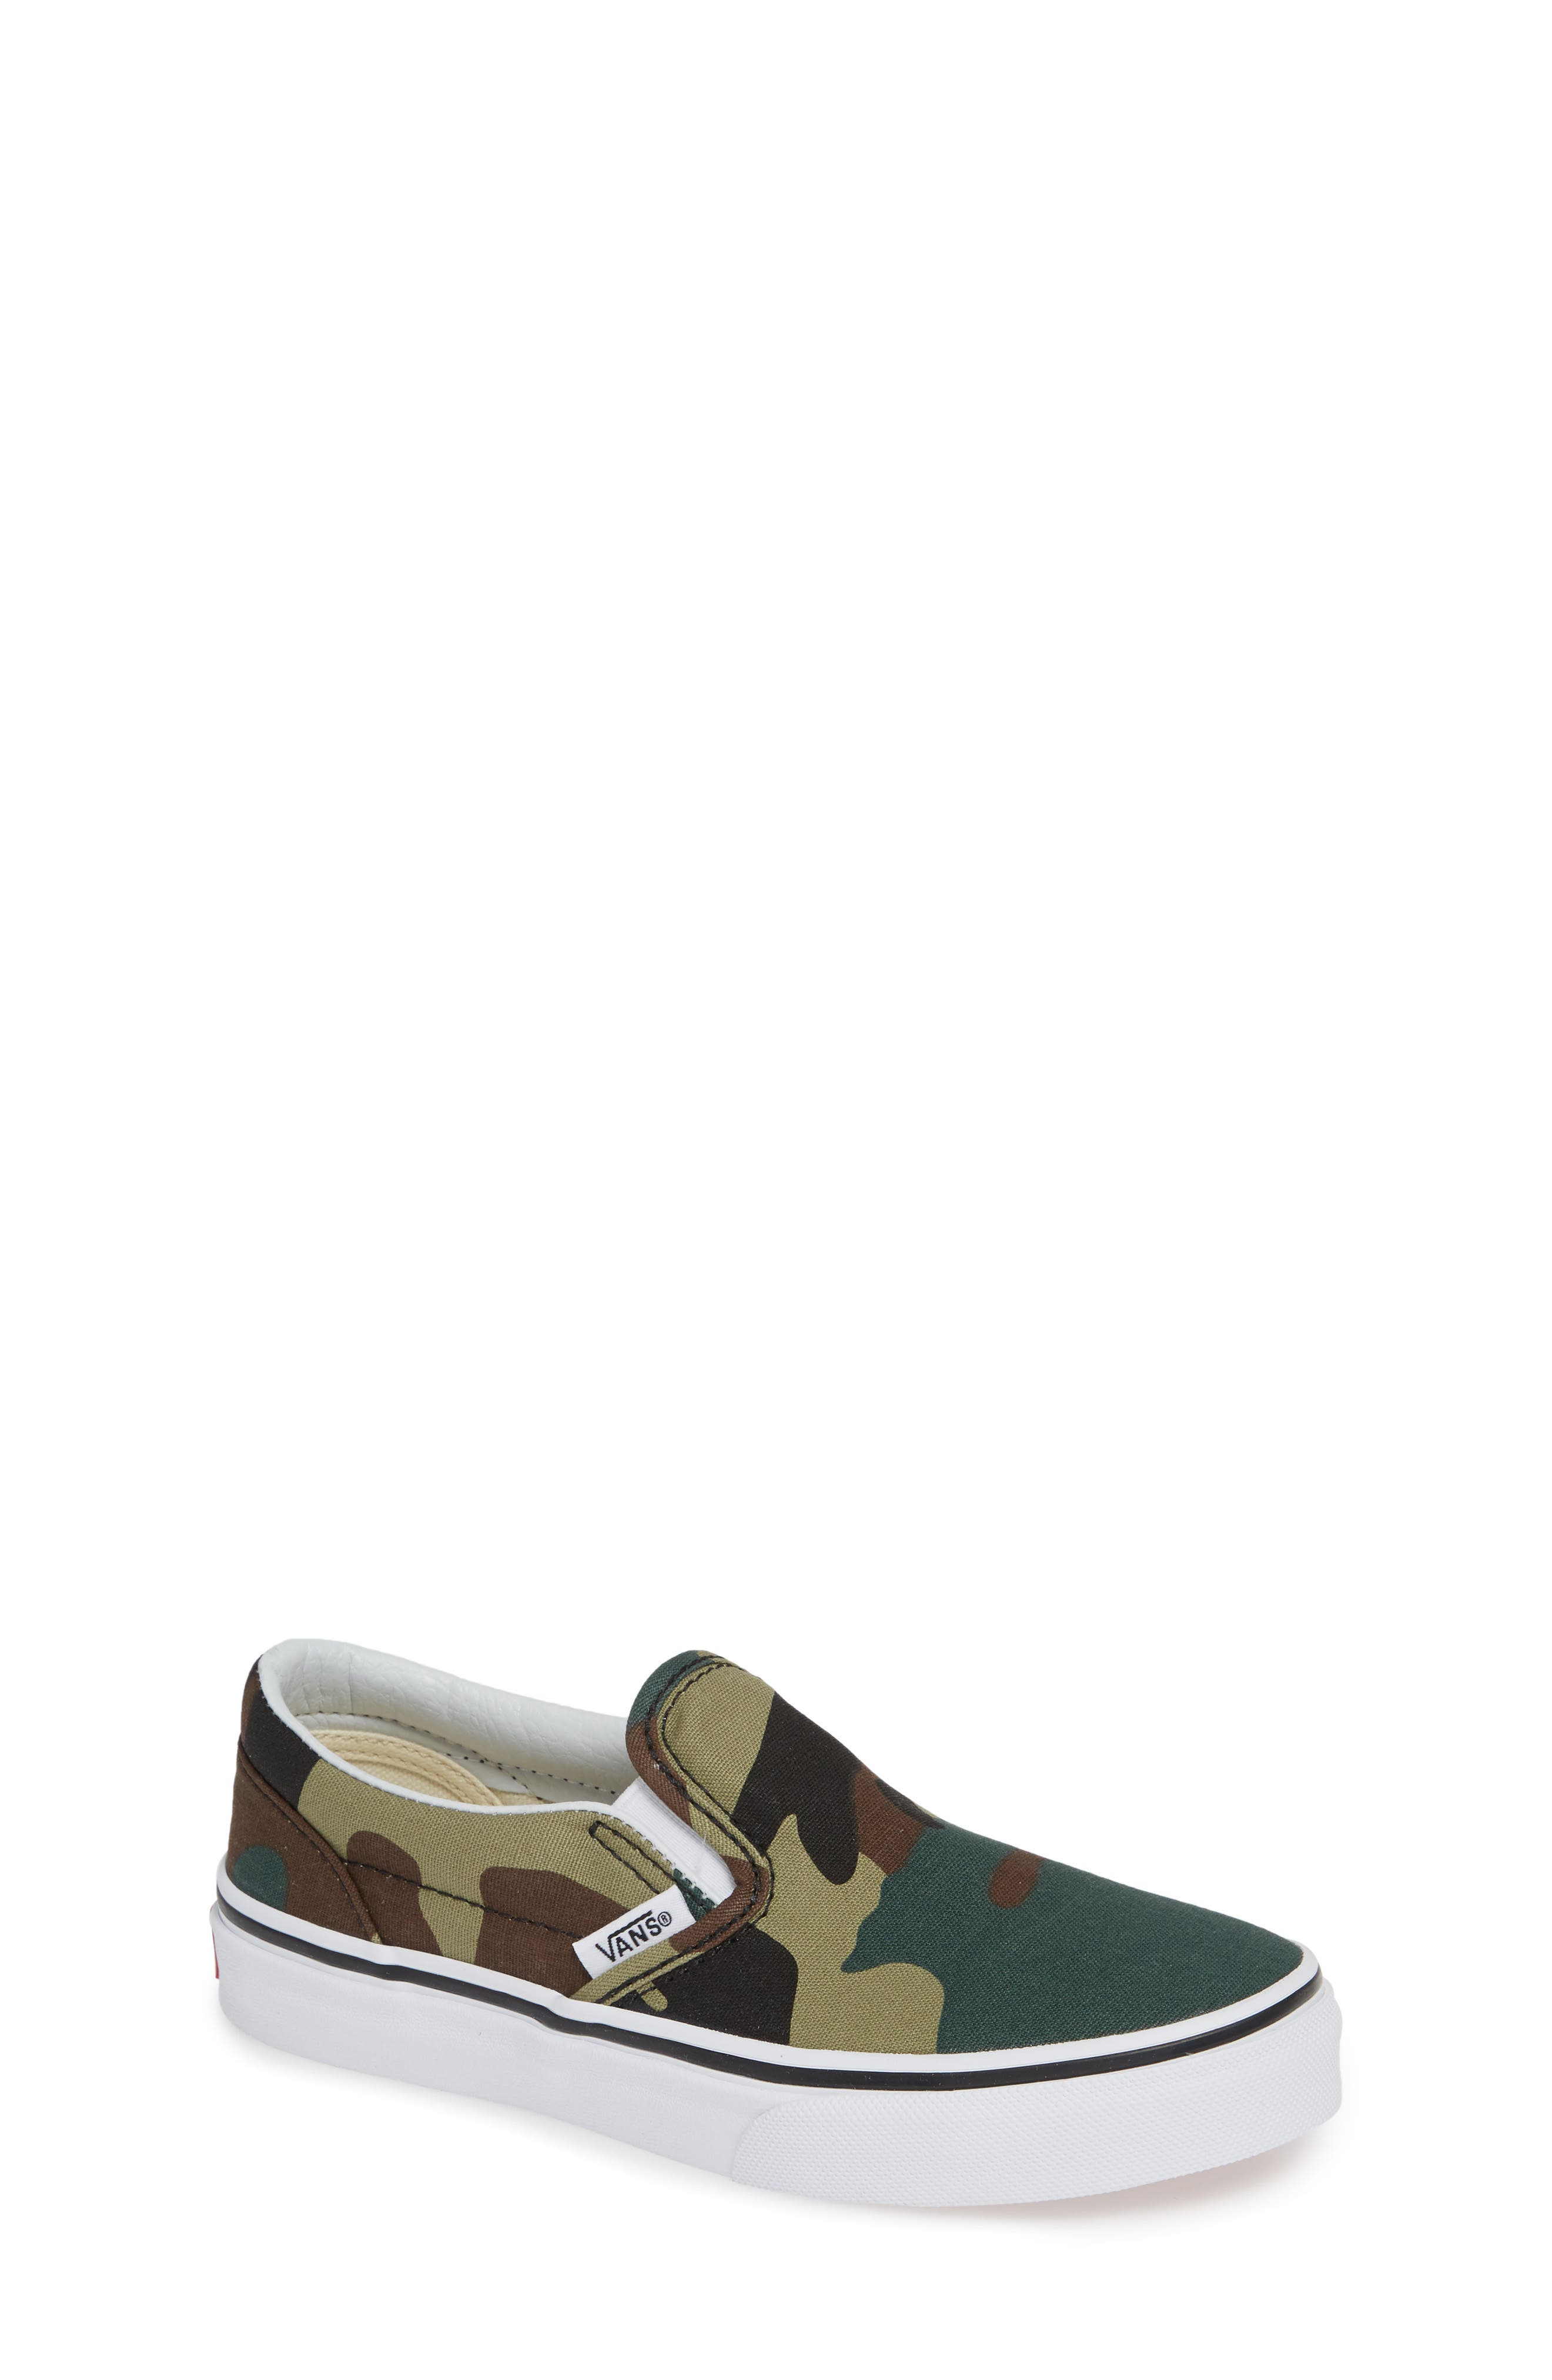 Classic Slip-On Sneaker,                         Main,                         color, WOODLAND CAMO BLACK/ WOODLAND